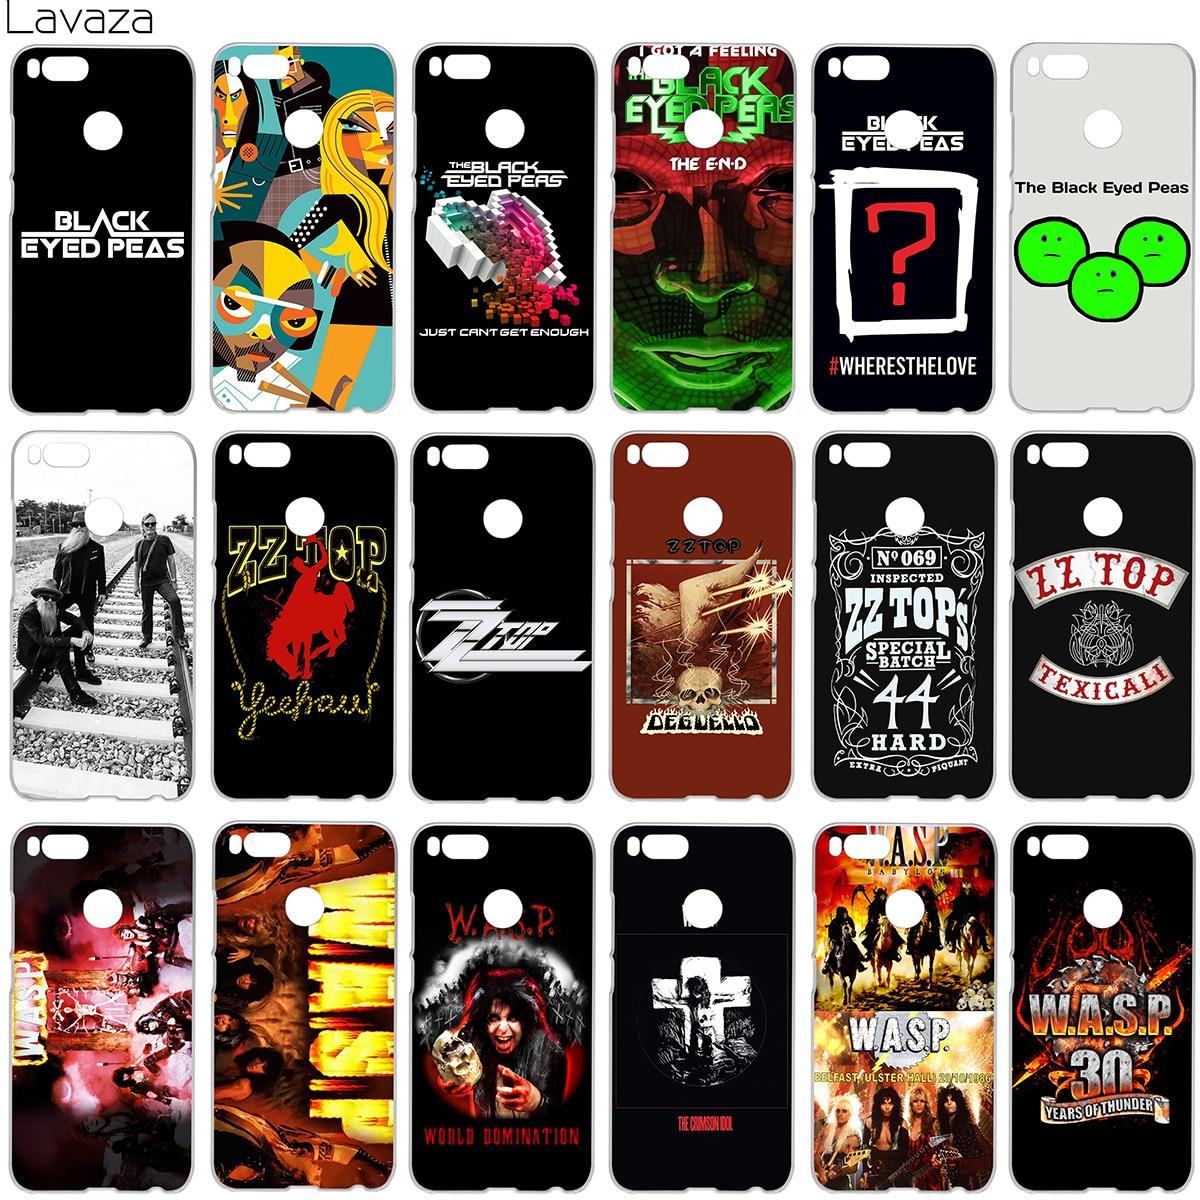 Lavaza The Black Eyed Peas ZZ Top W.A.S.P Band Case for Xiaomi Redmi Note 4X MI A1 4 5 6 Plus 4A MI6 Pro 5A